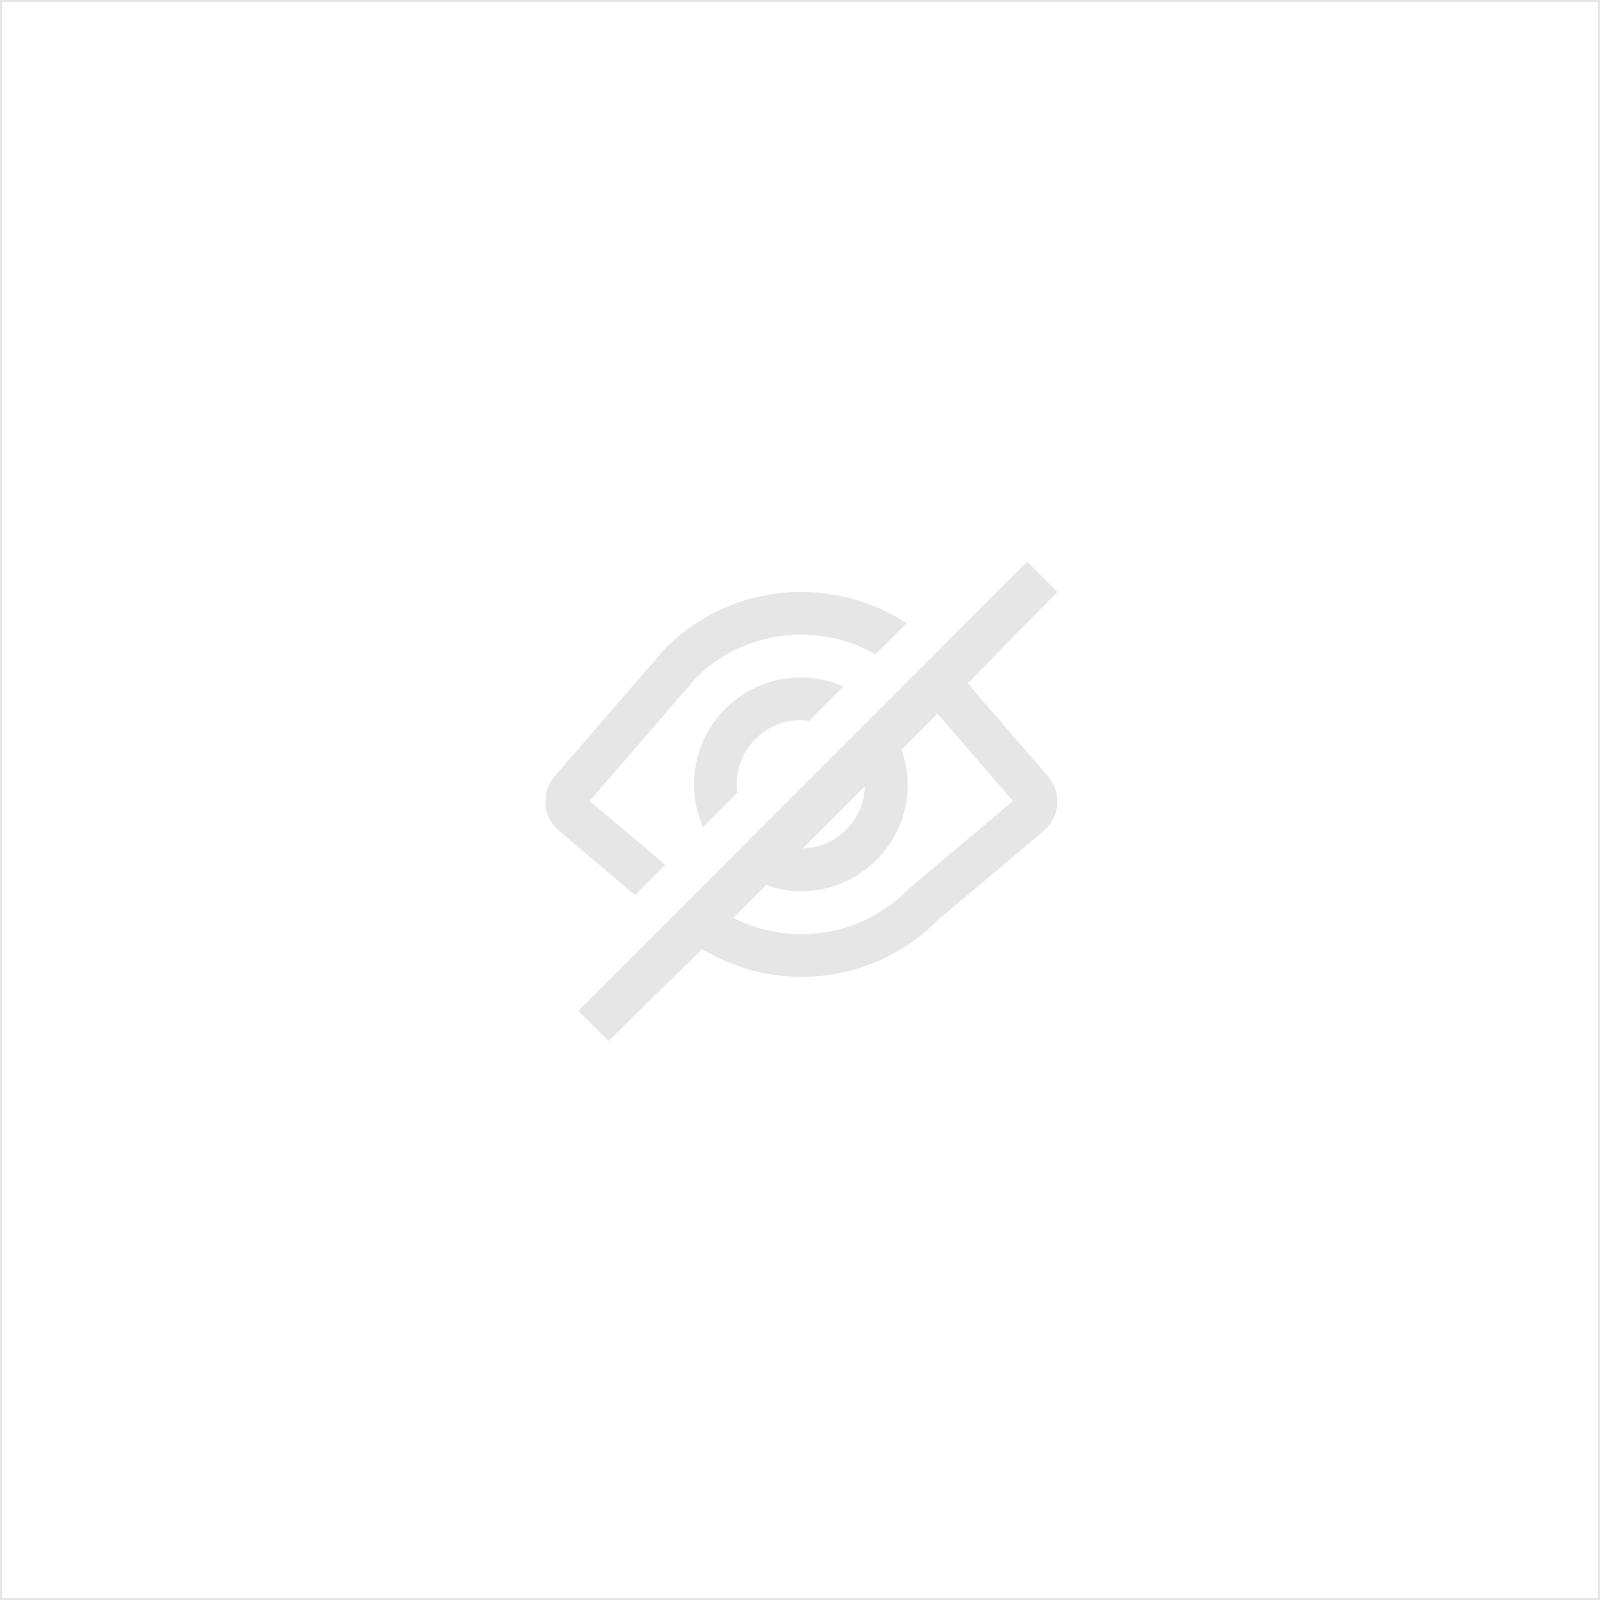 MEGUIAR'S Perfect clarity glass towel (X190301)